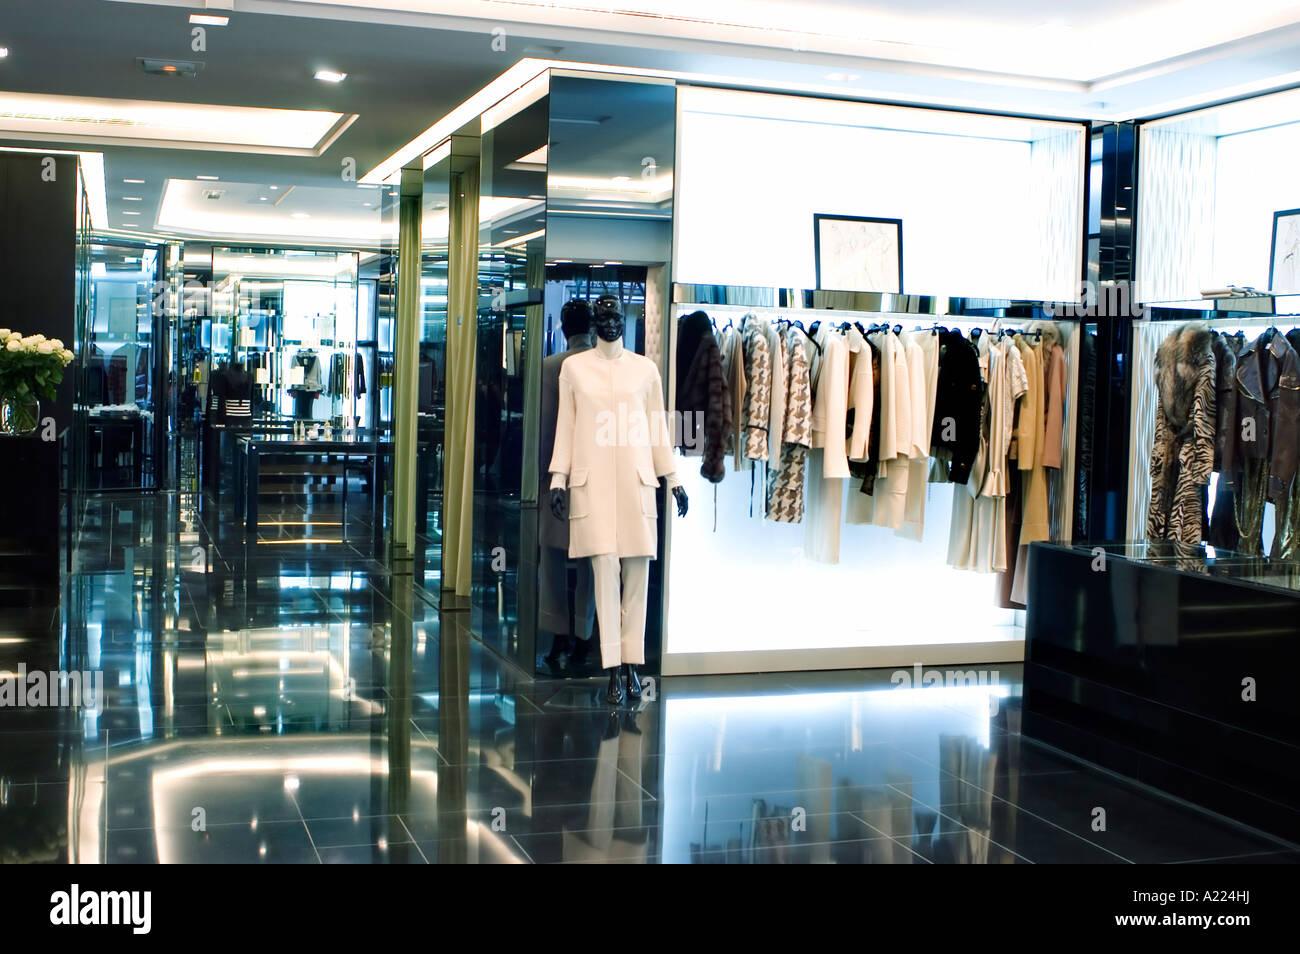 paris france luxury shopping fashion brand shops boutique stock photo royalty free image. Black Bedroom Furniture Sets. Home Design Ideas